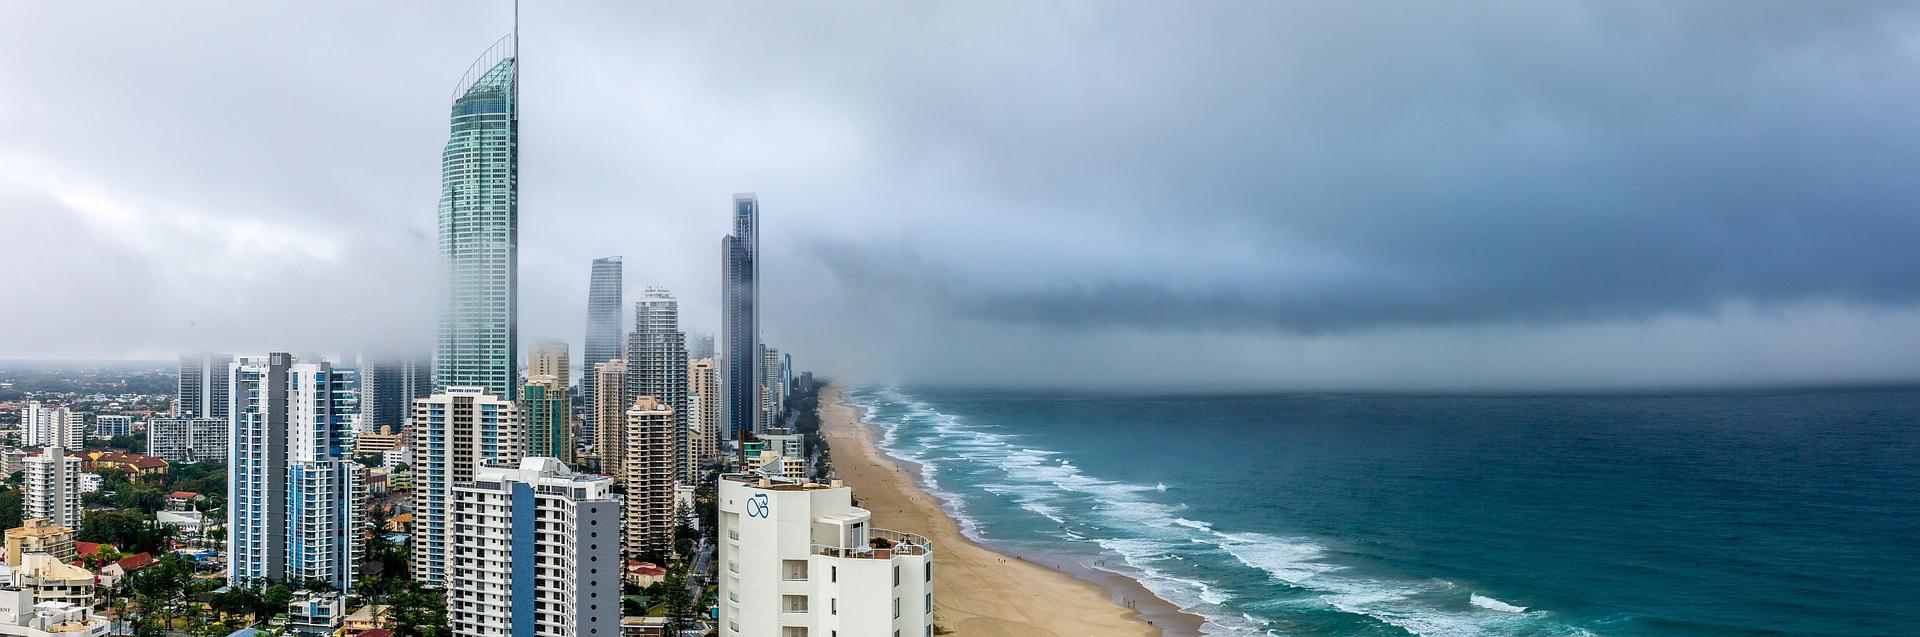 panoramic-landscape-949448_1920.jpg